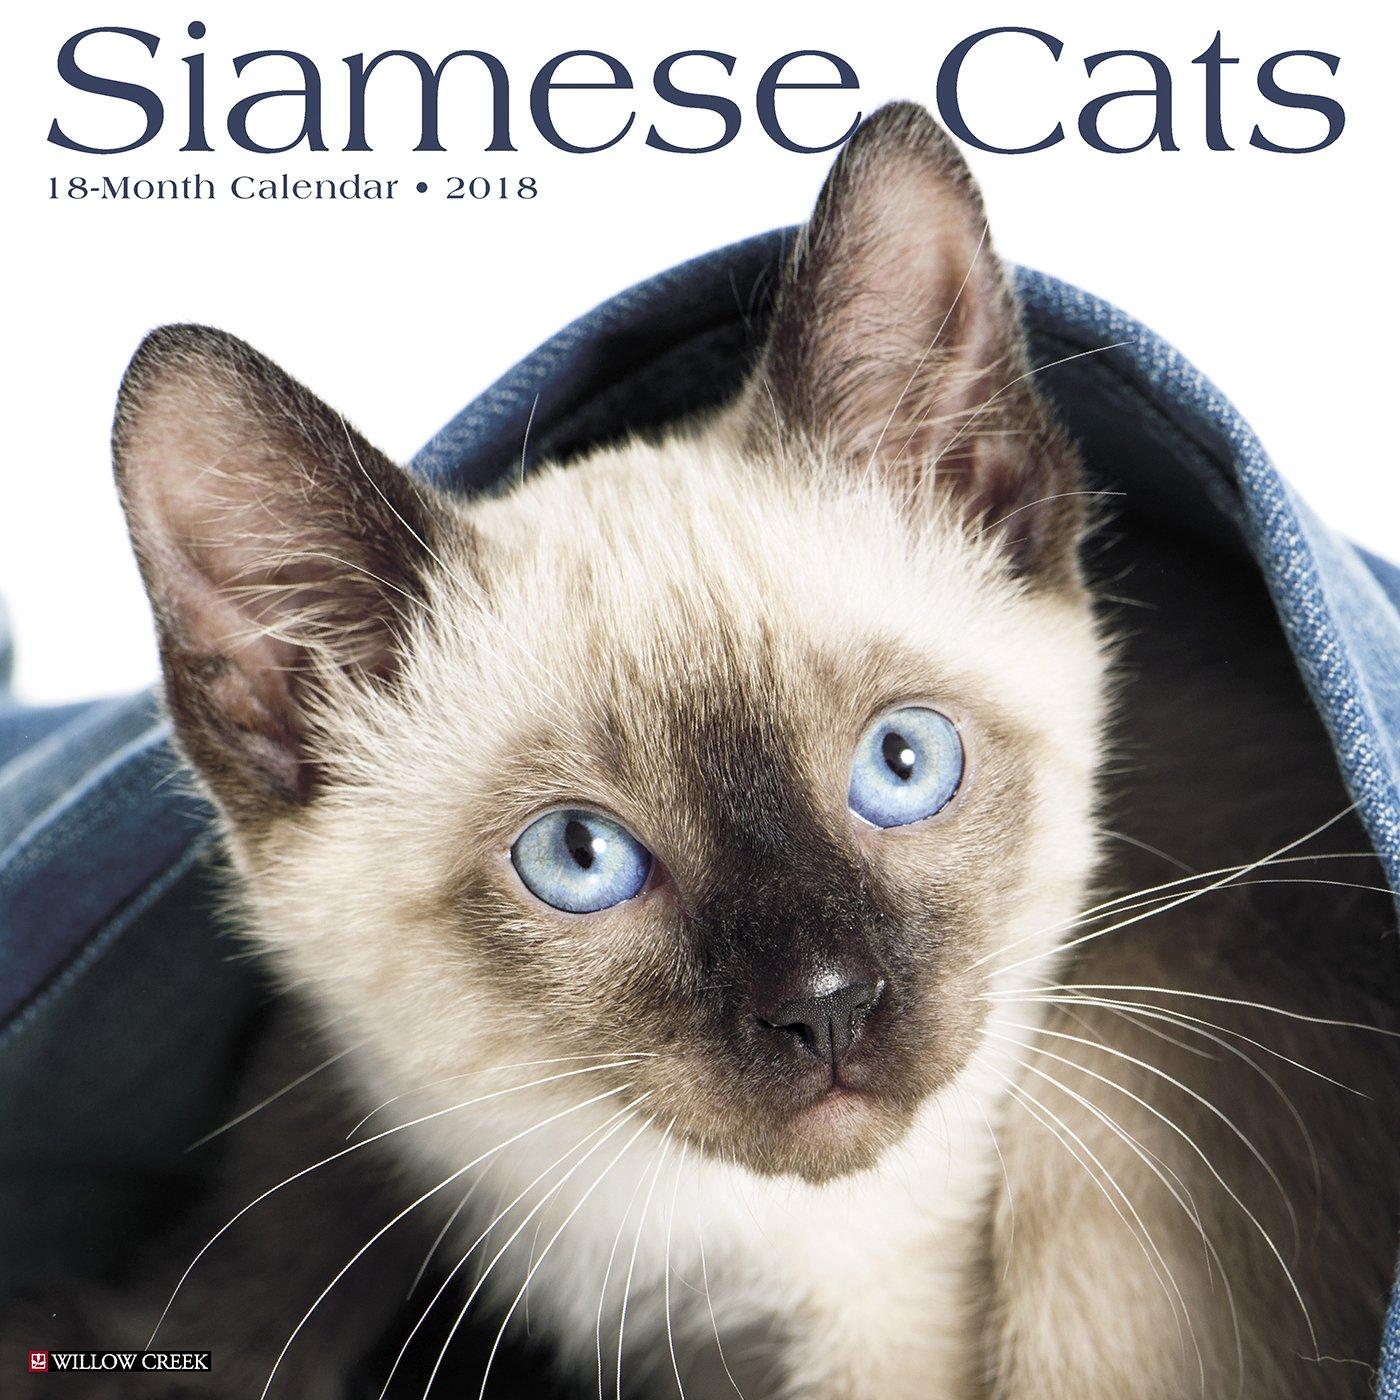 Siamese Cats 2018 Calendar Willow Creek Press